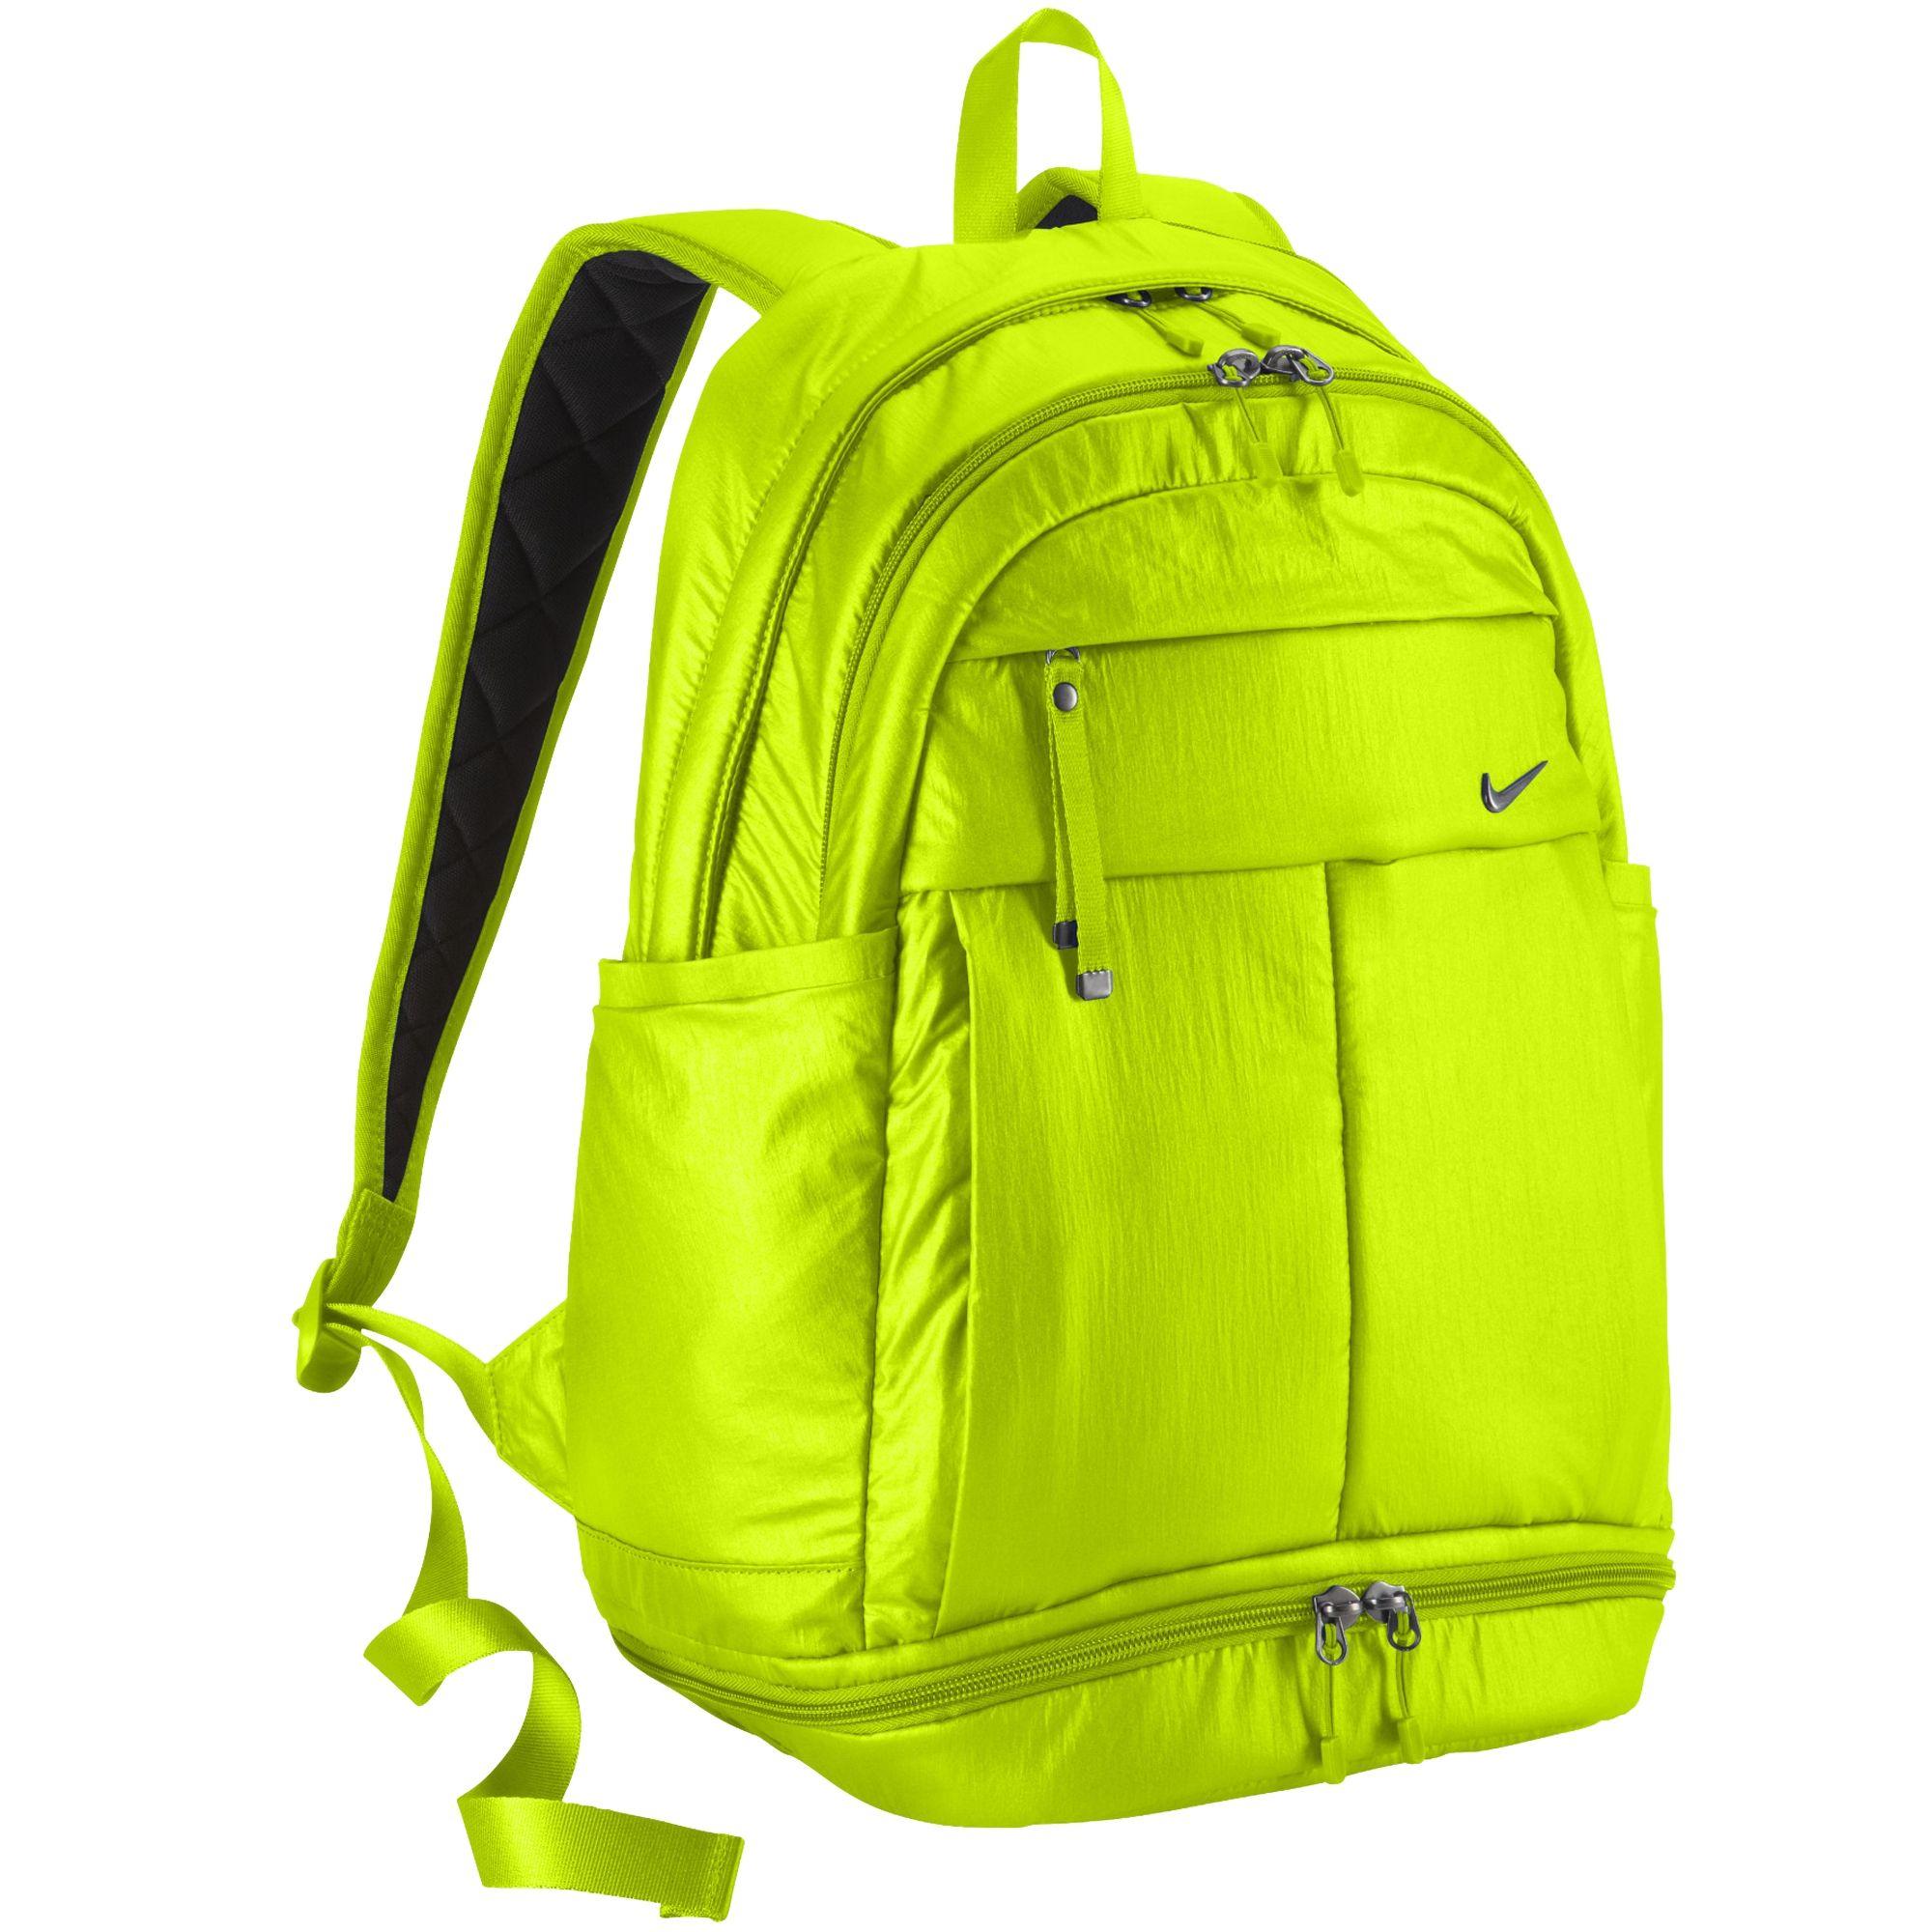 da5b185f0f153 Nike Victory Backpack Sırt Çantası